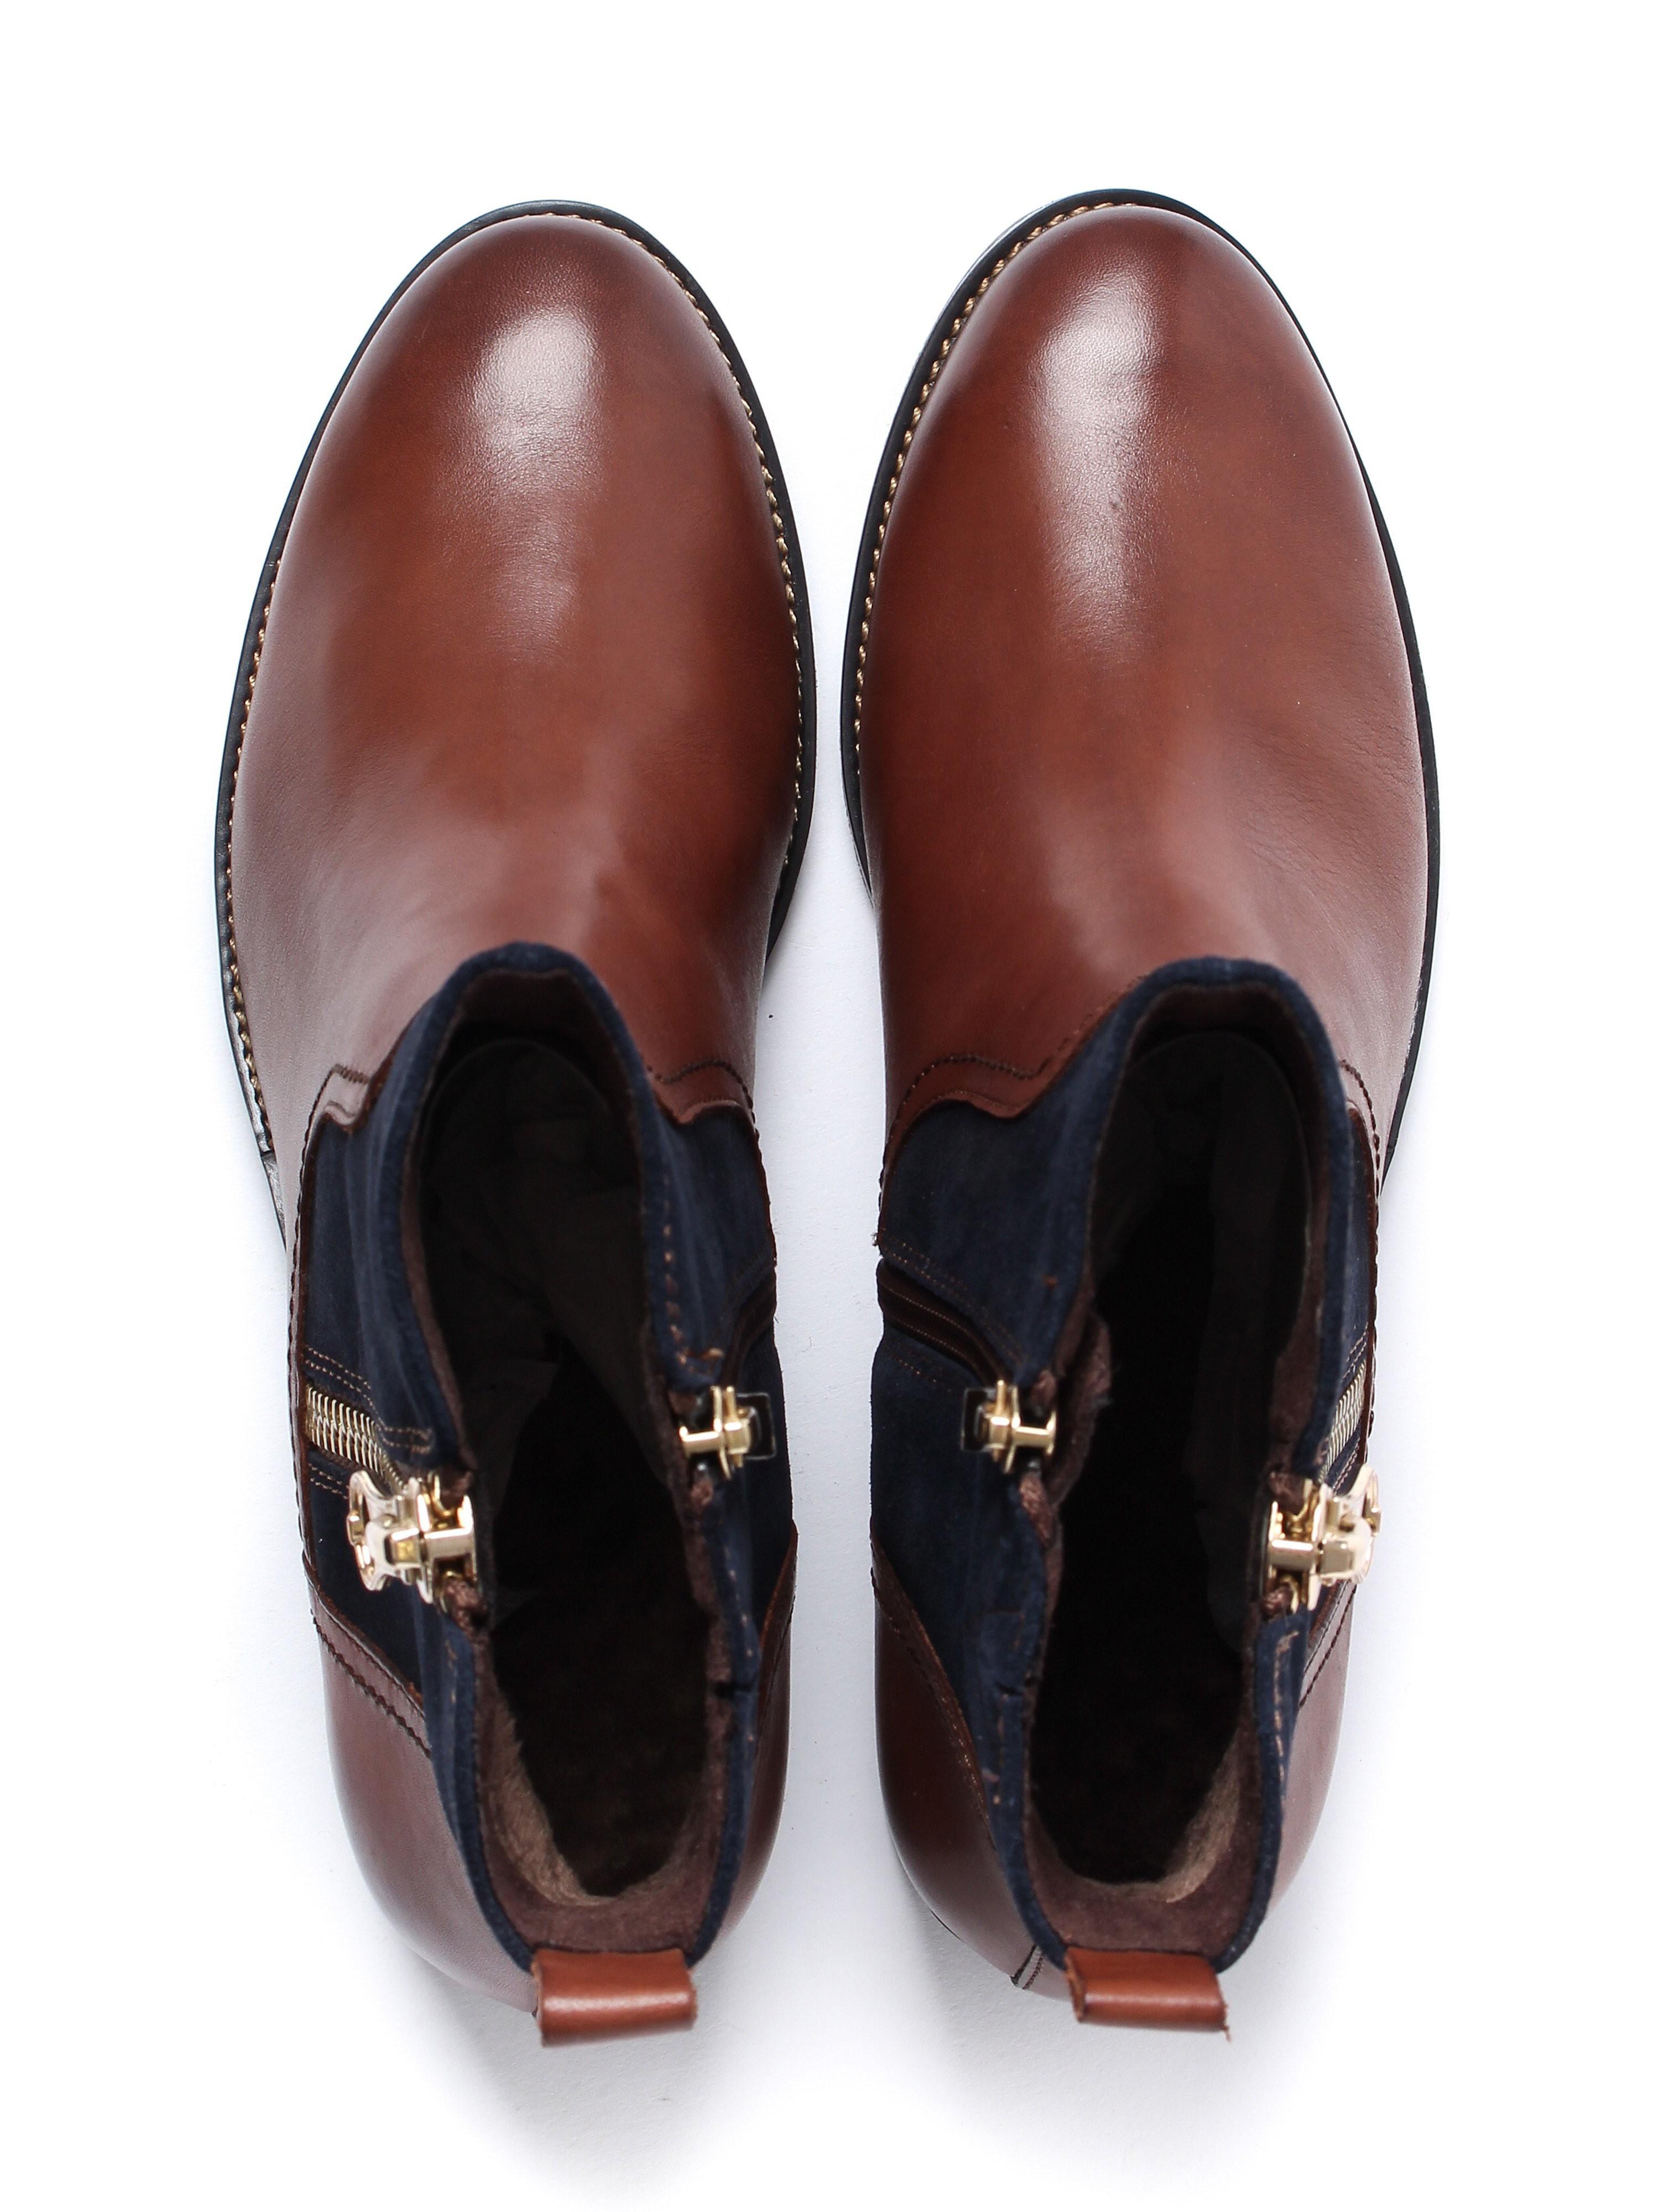 Caprice Women's Zip Ankle Boots - Cognac Leather